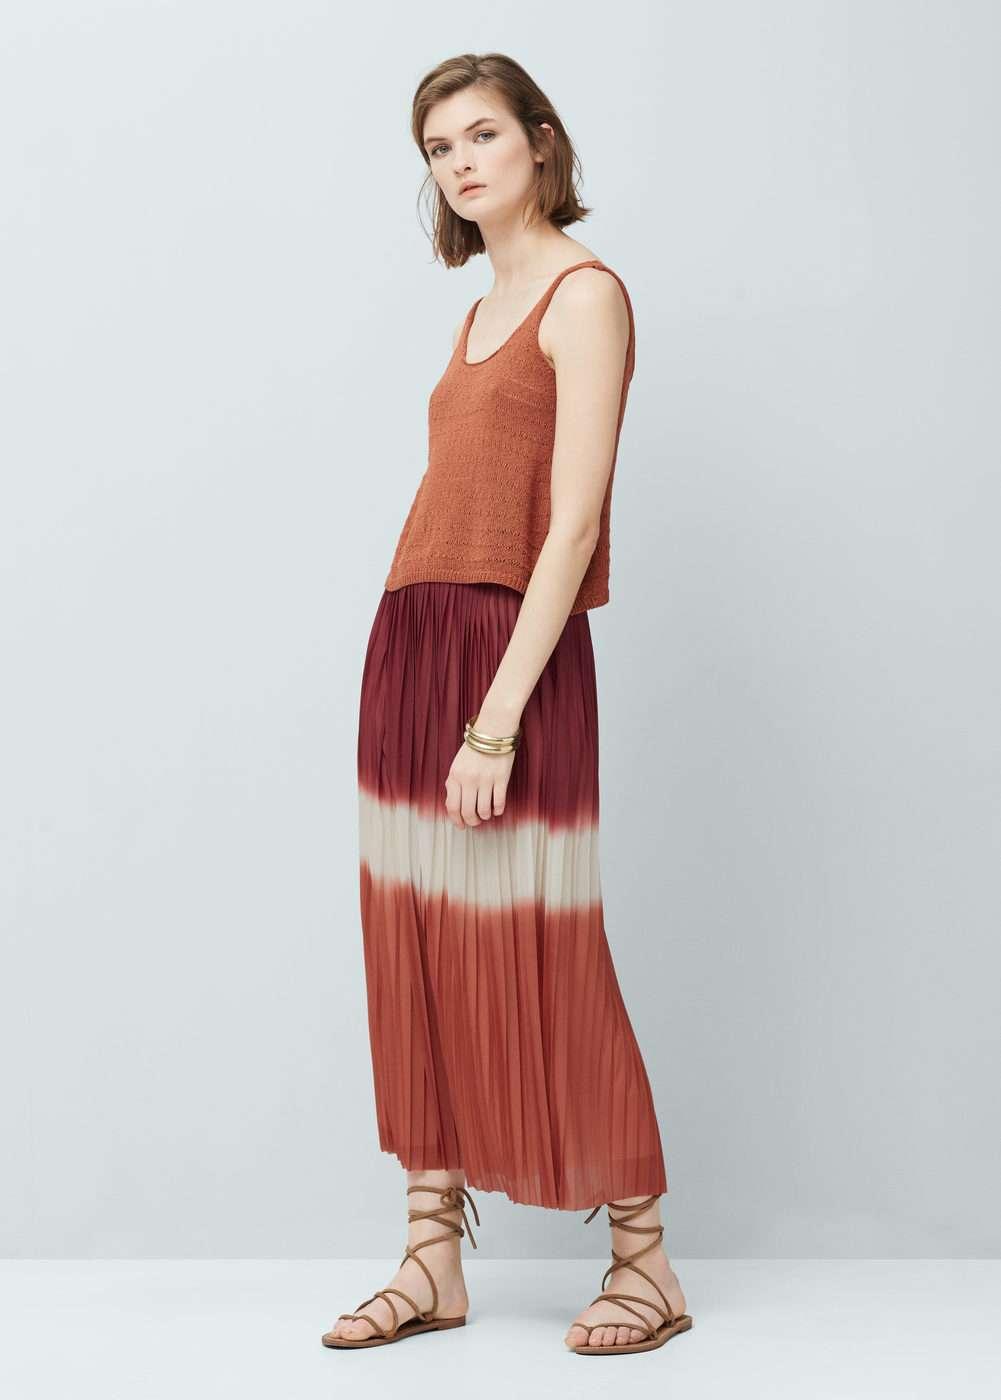 Mango verano 2016 - falda plisada